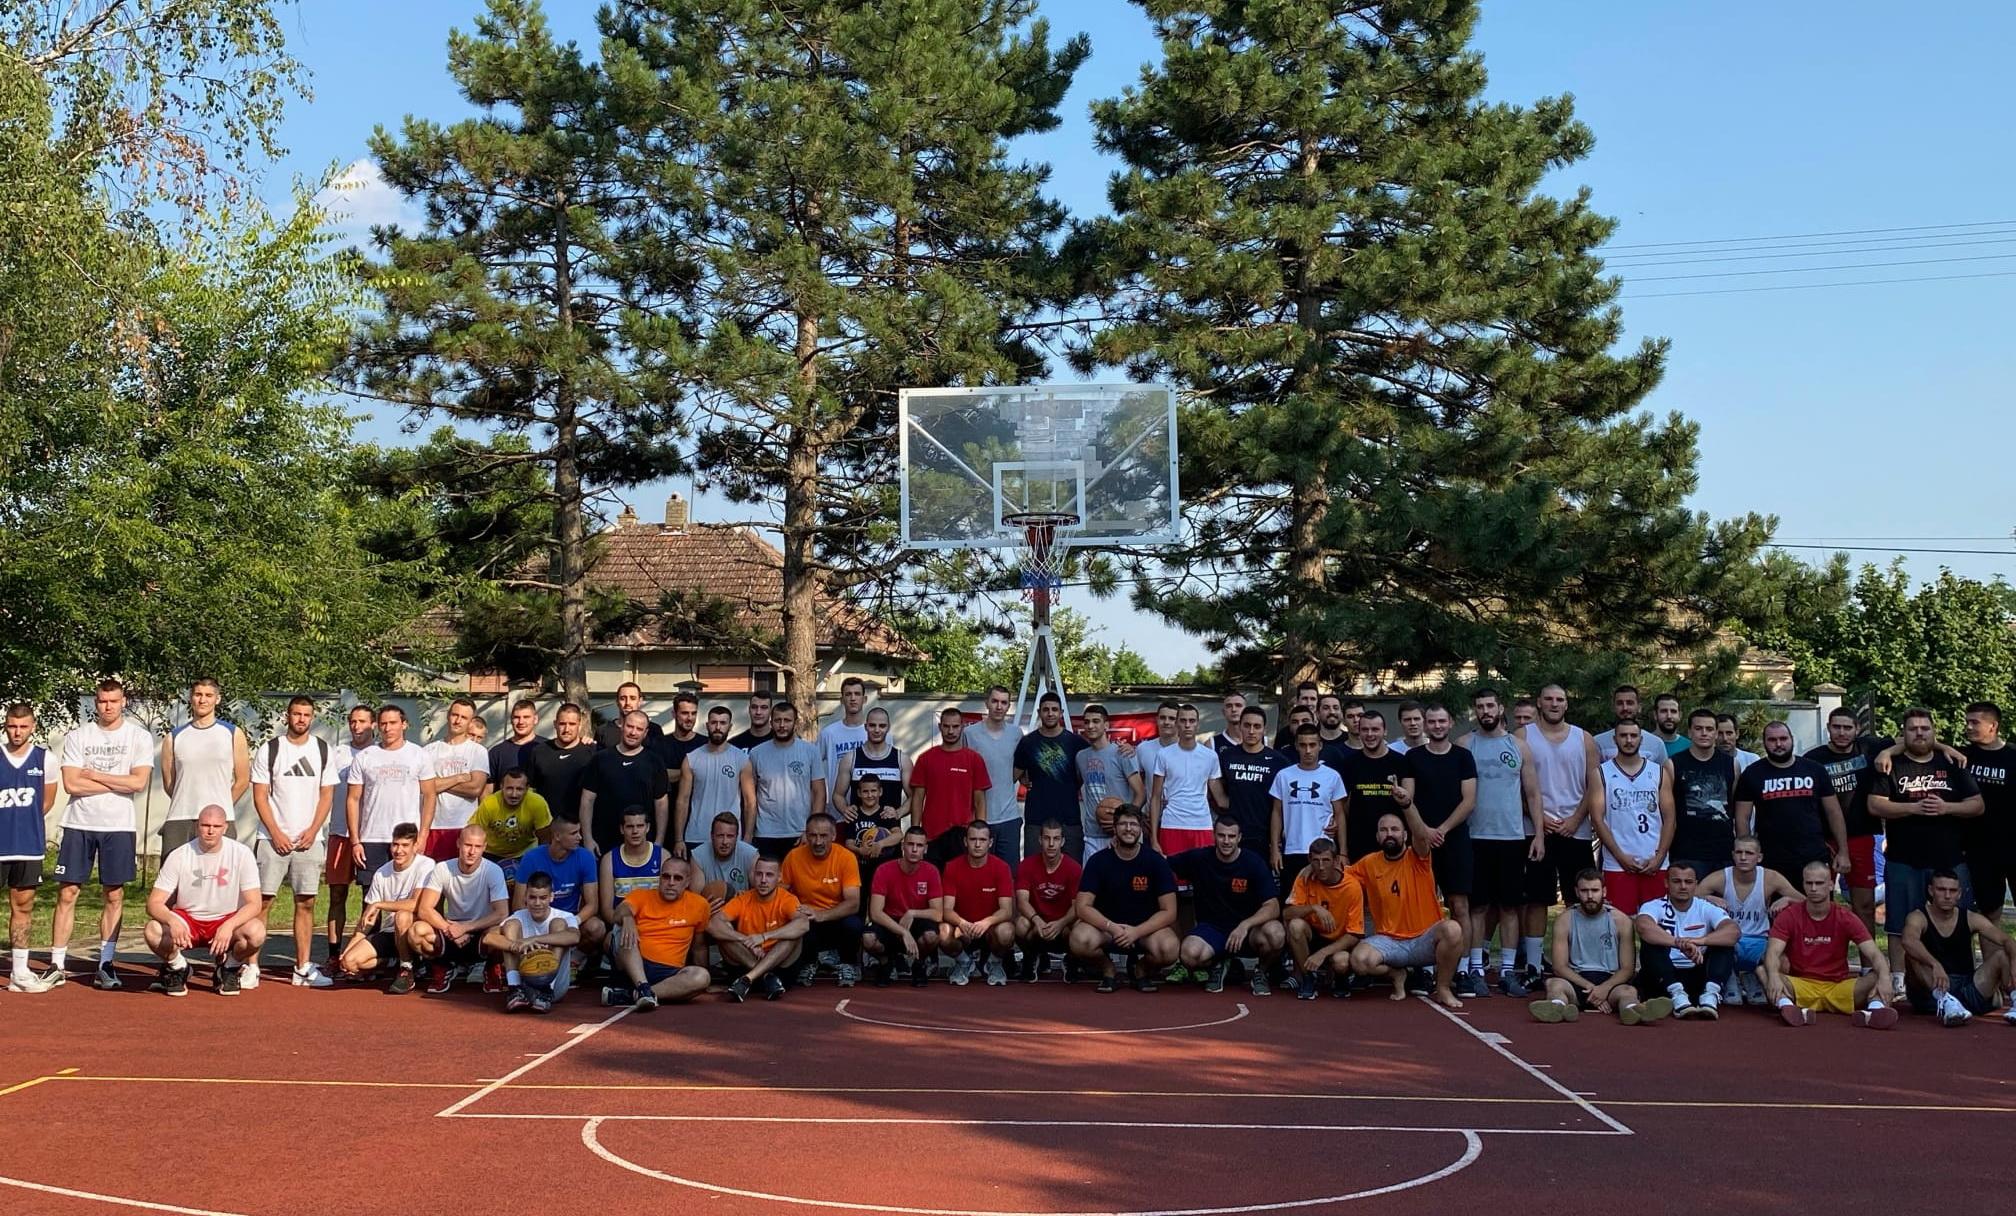 Drugi košarkaški turnir u Međi